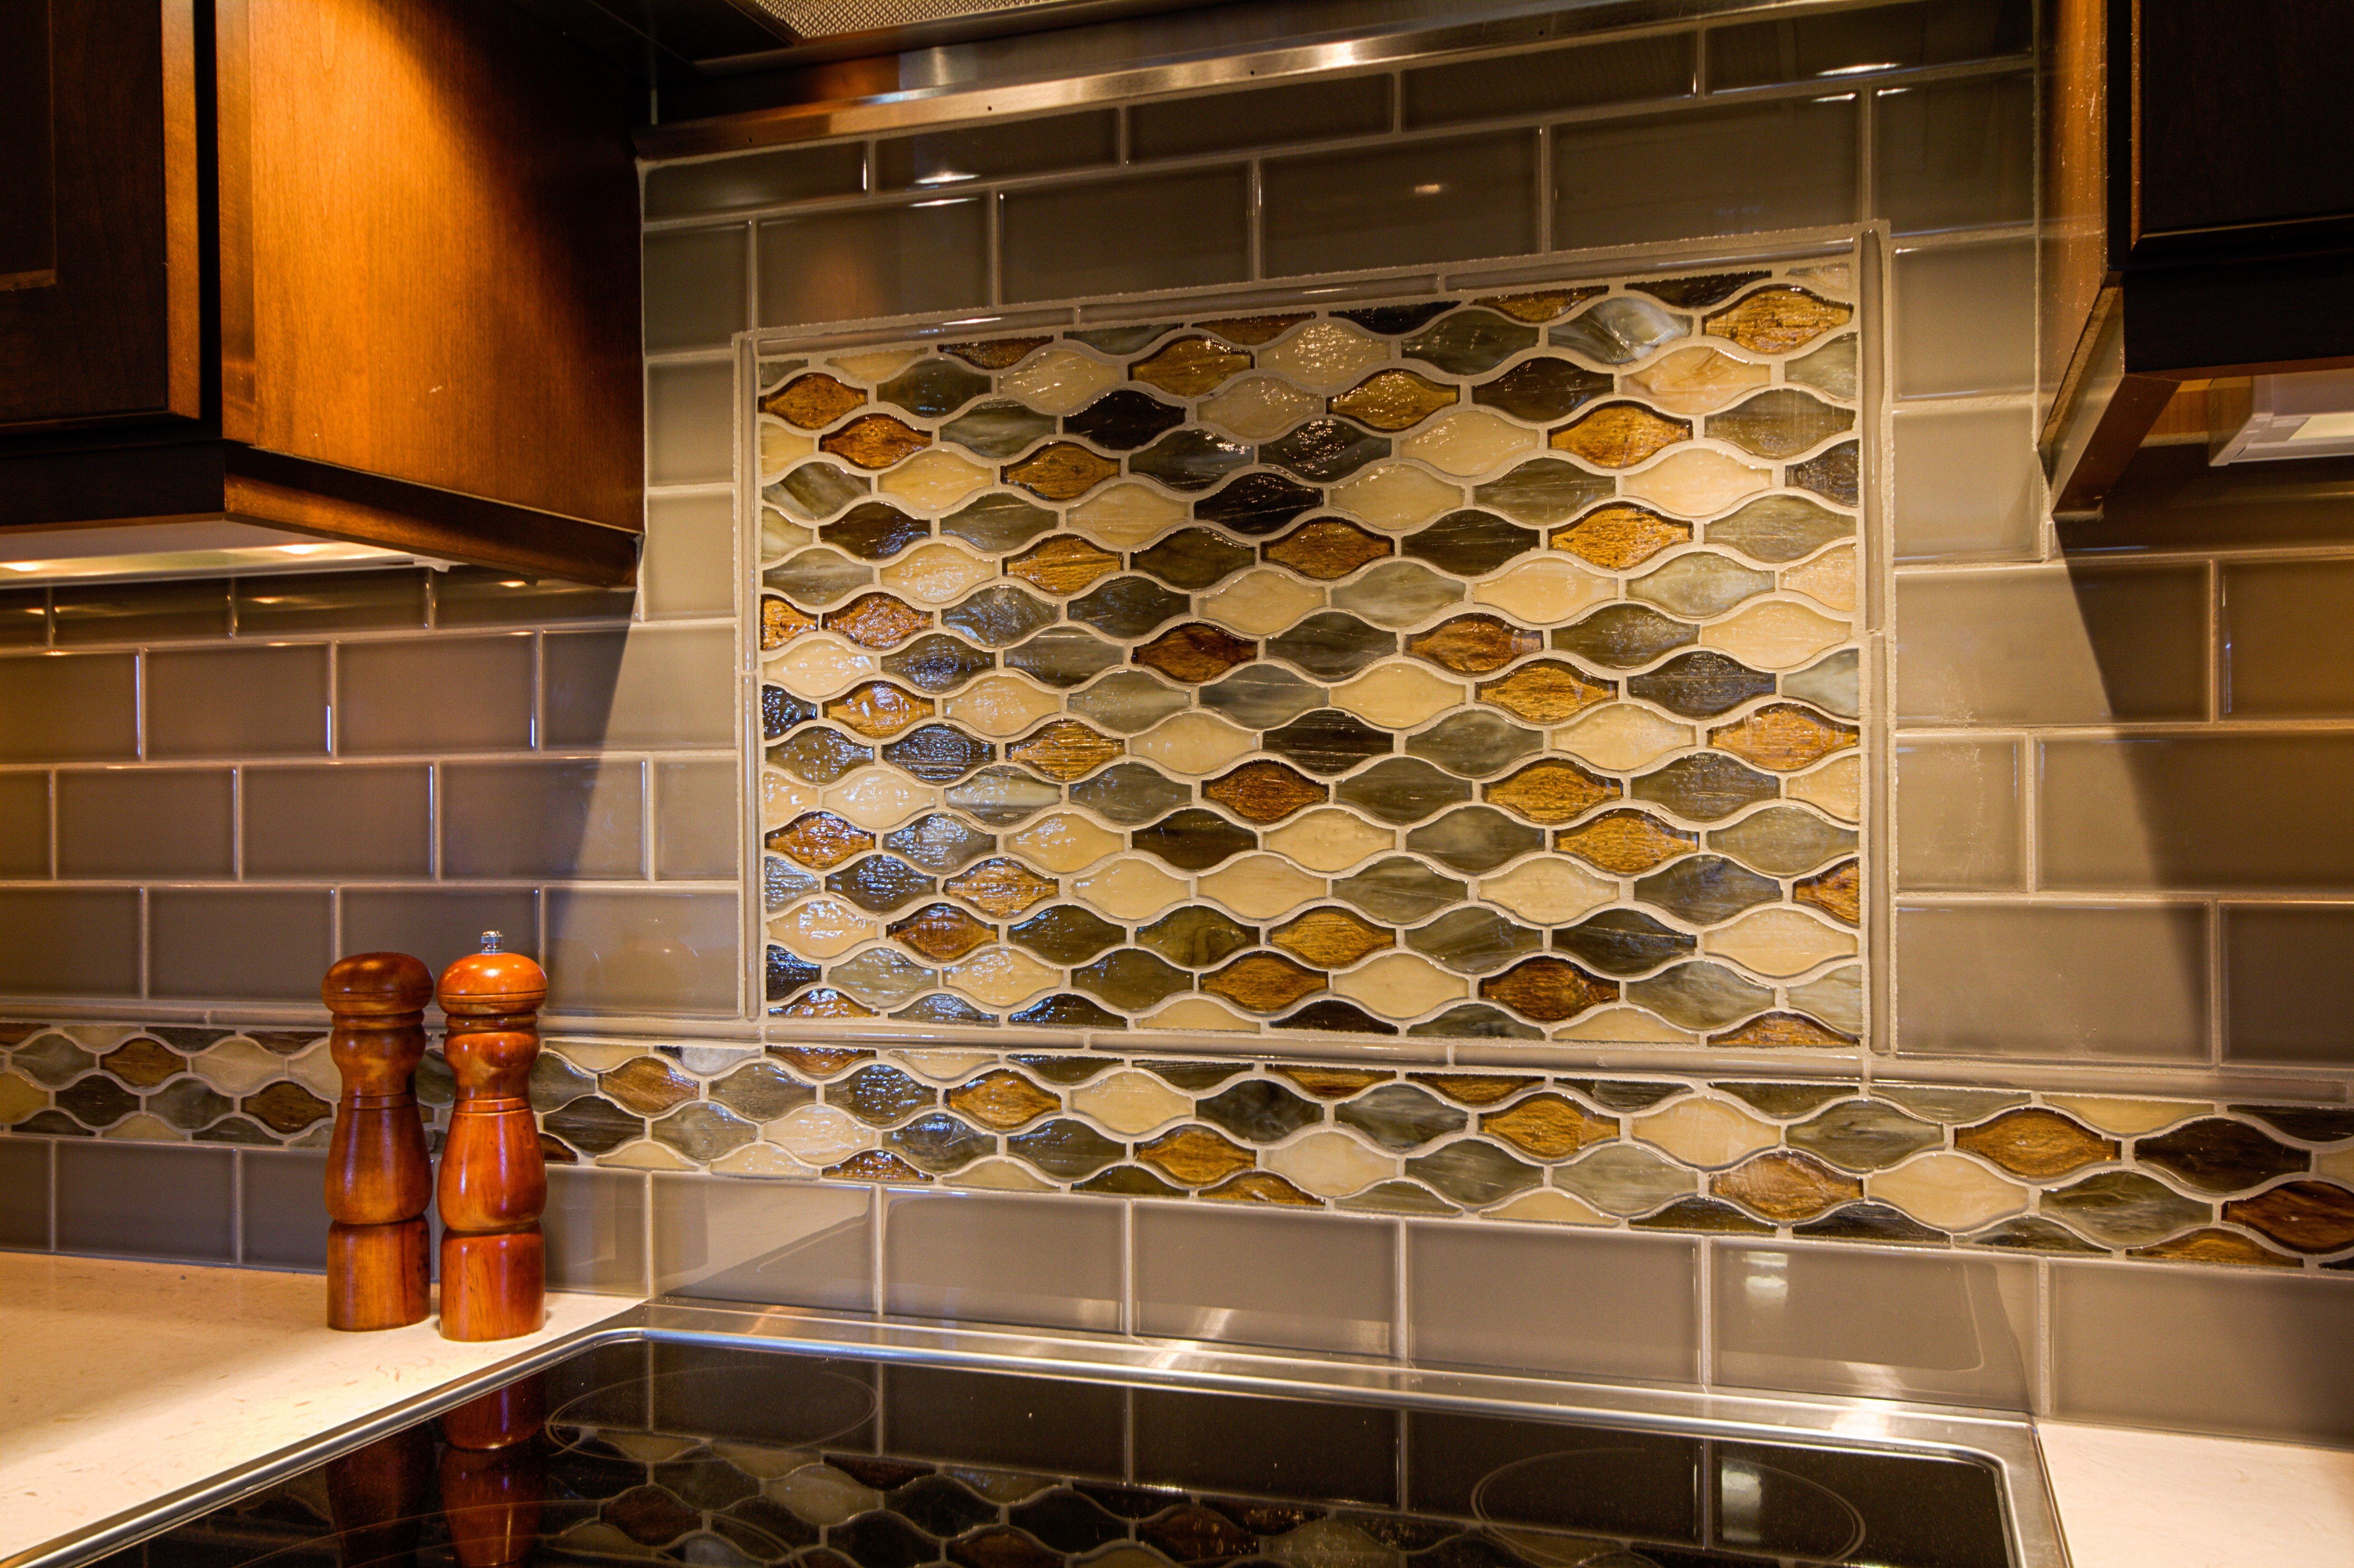 Kitchen Remodeling and Design, glazzio tile, tile medallion above the stove, brown and grey backsplash